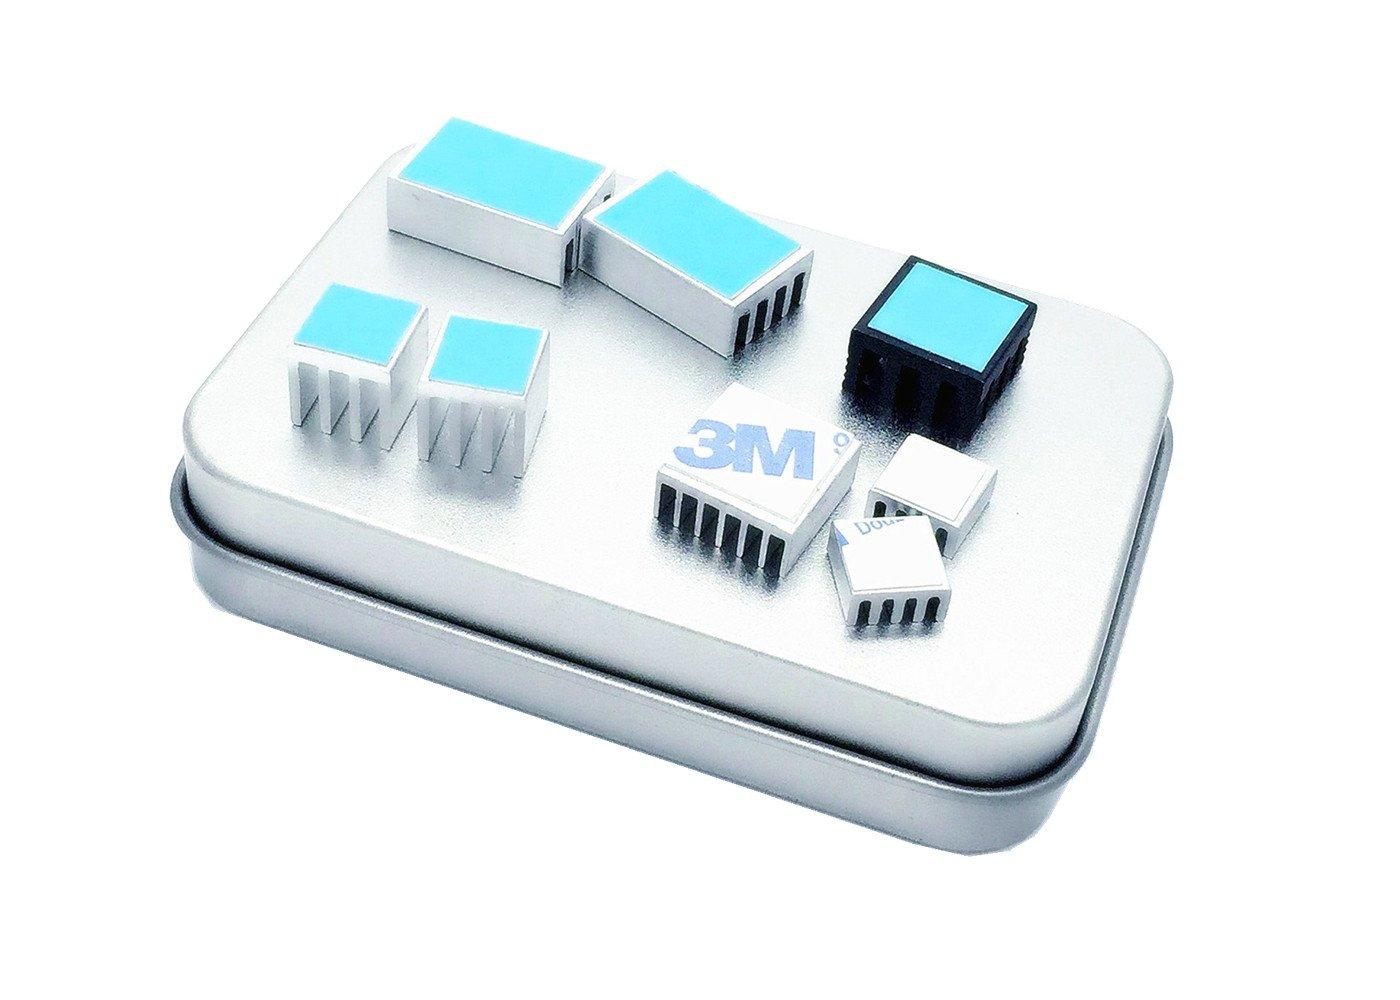 OdiySurveil(TM) Aluminum Heatsink Cooler Circuit board Cooling Fin for Raspberry Pi,VGA RAM,IC Chips,MOSFET SCR(Pack of 5 DIY Heatsinks+3 Free)